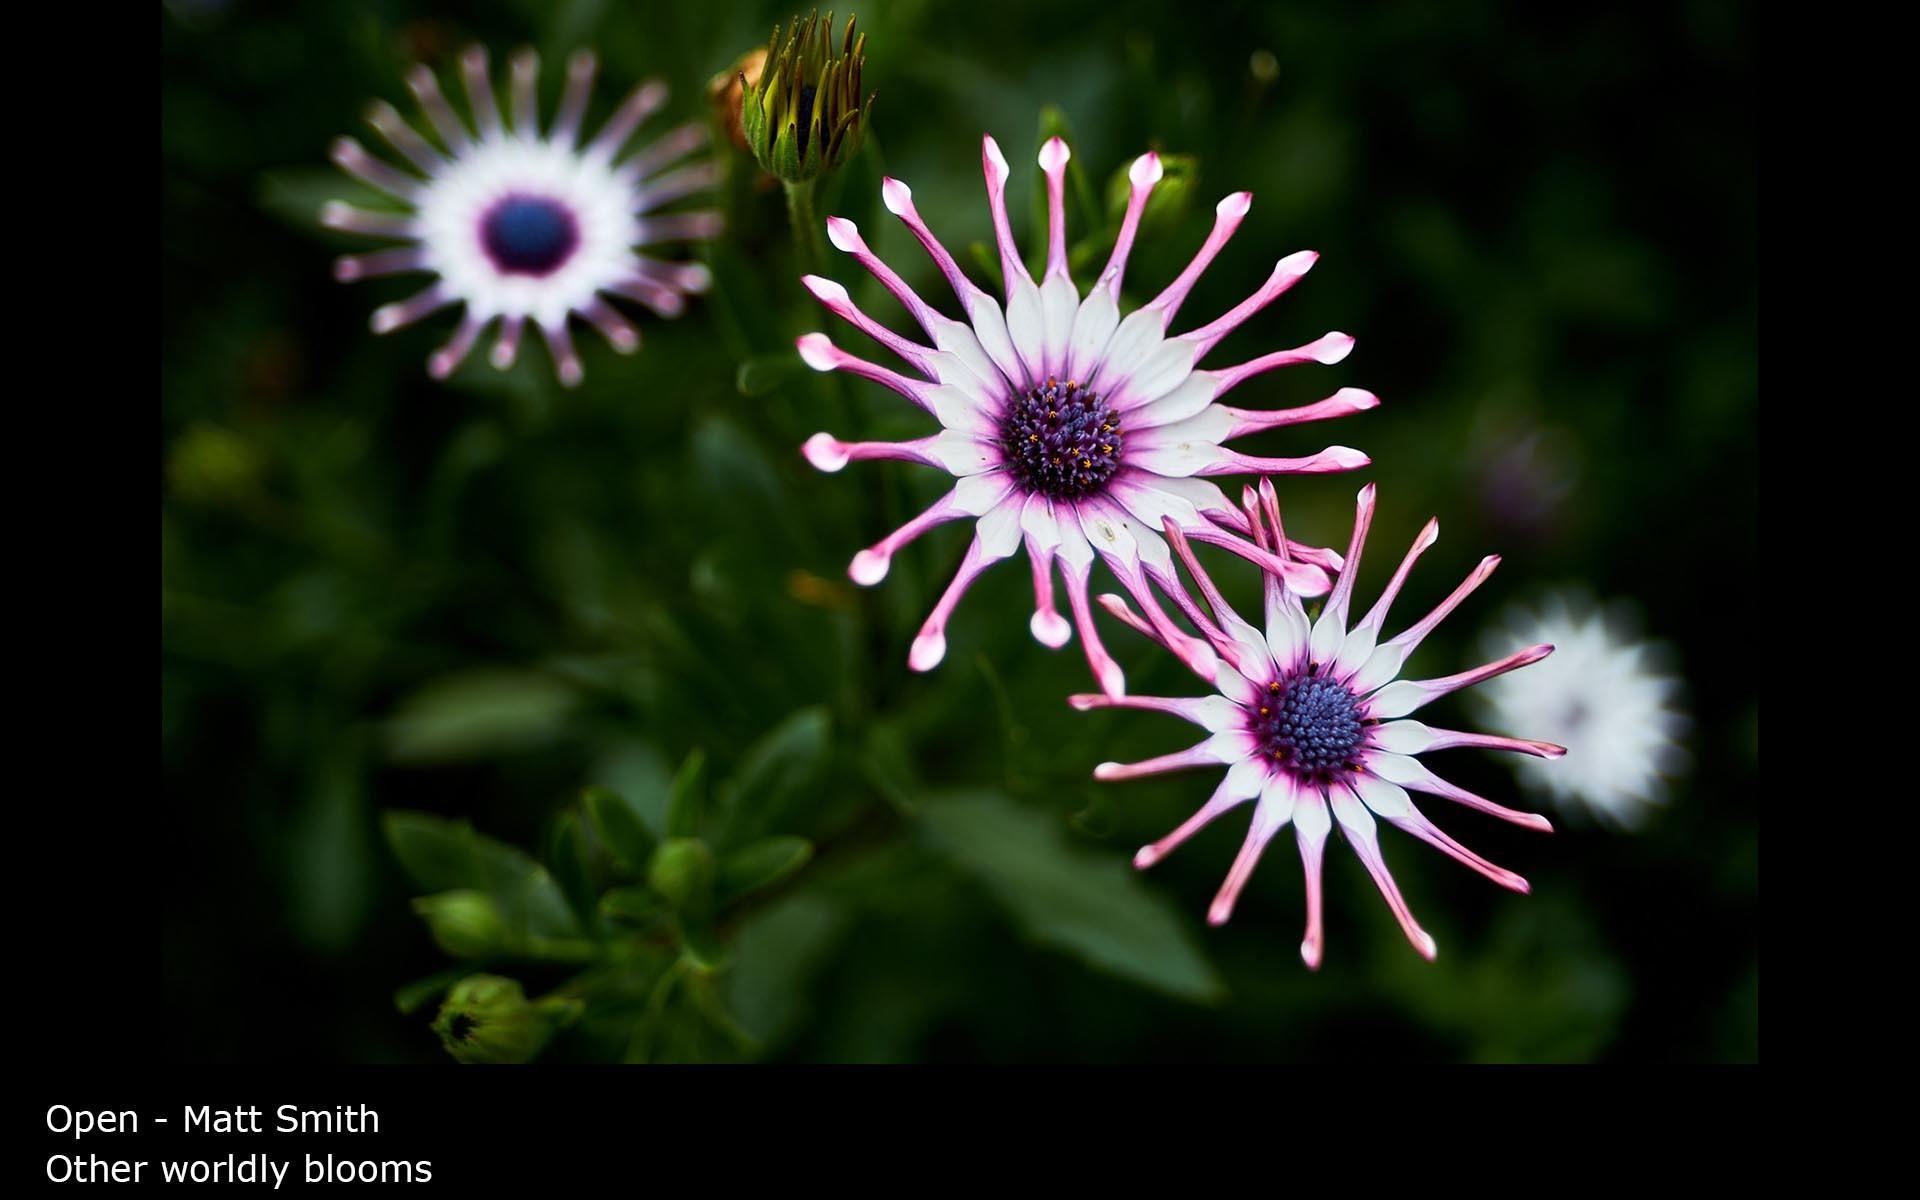 Other worldly blooms - Matt Smith